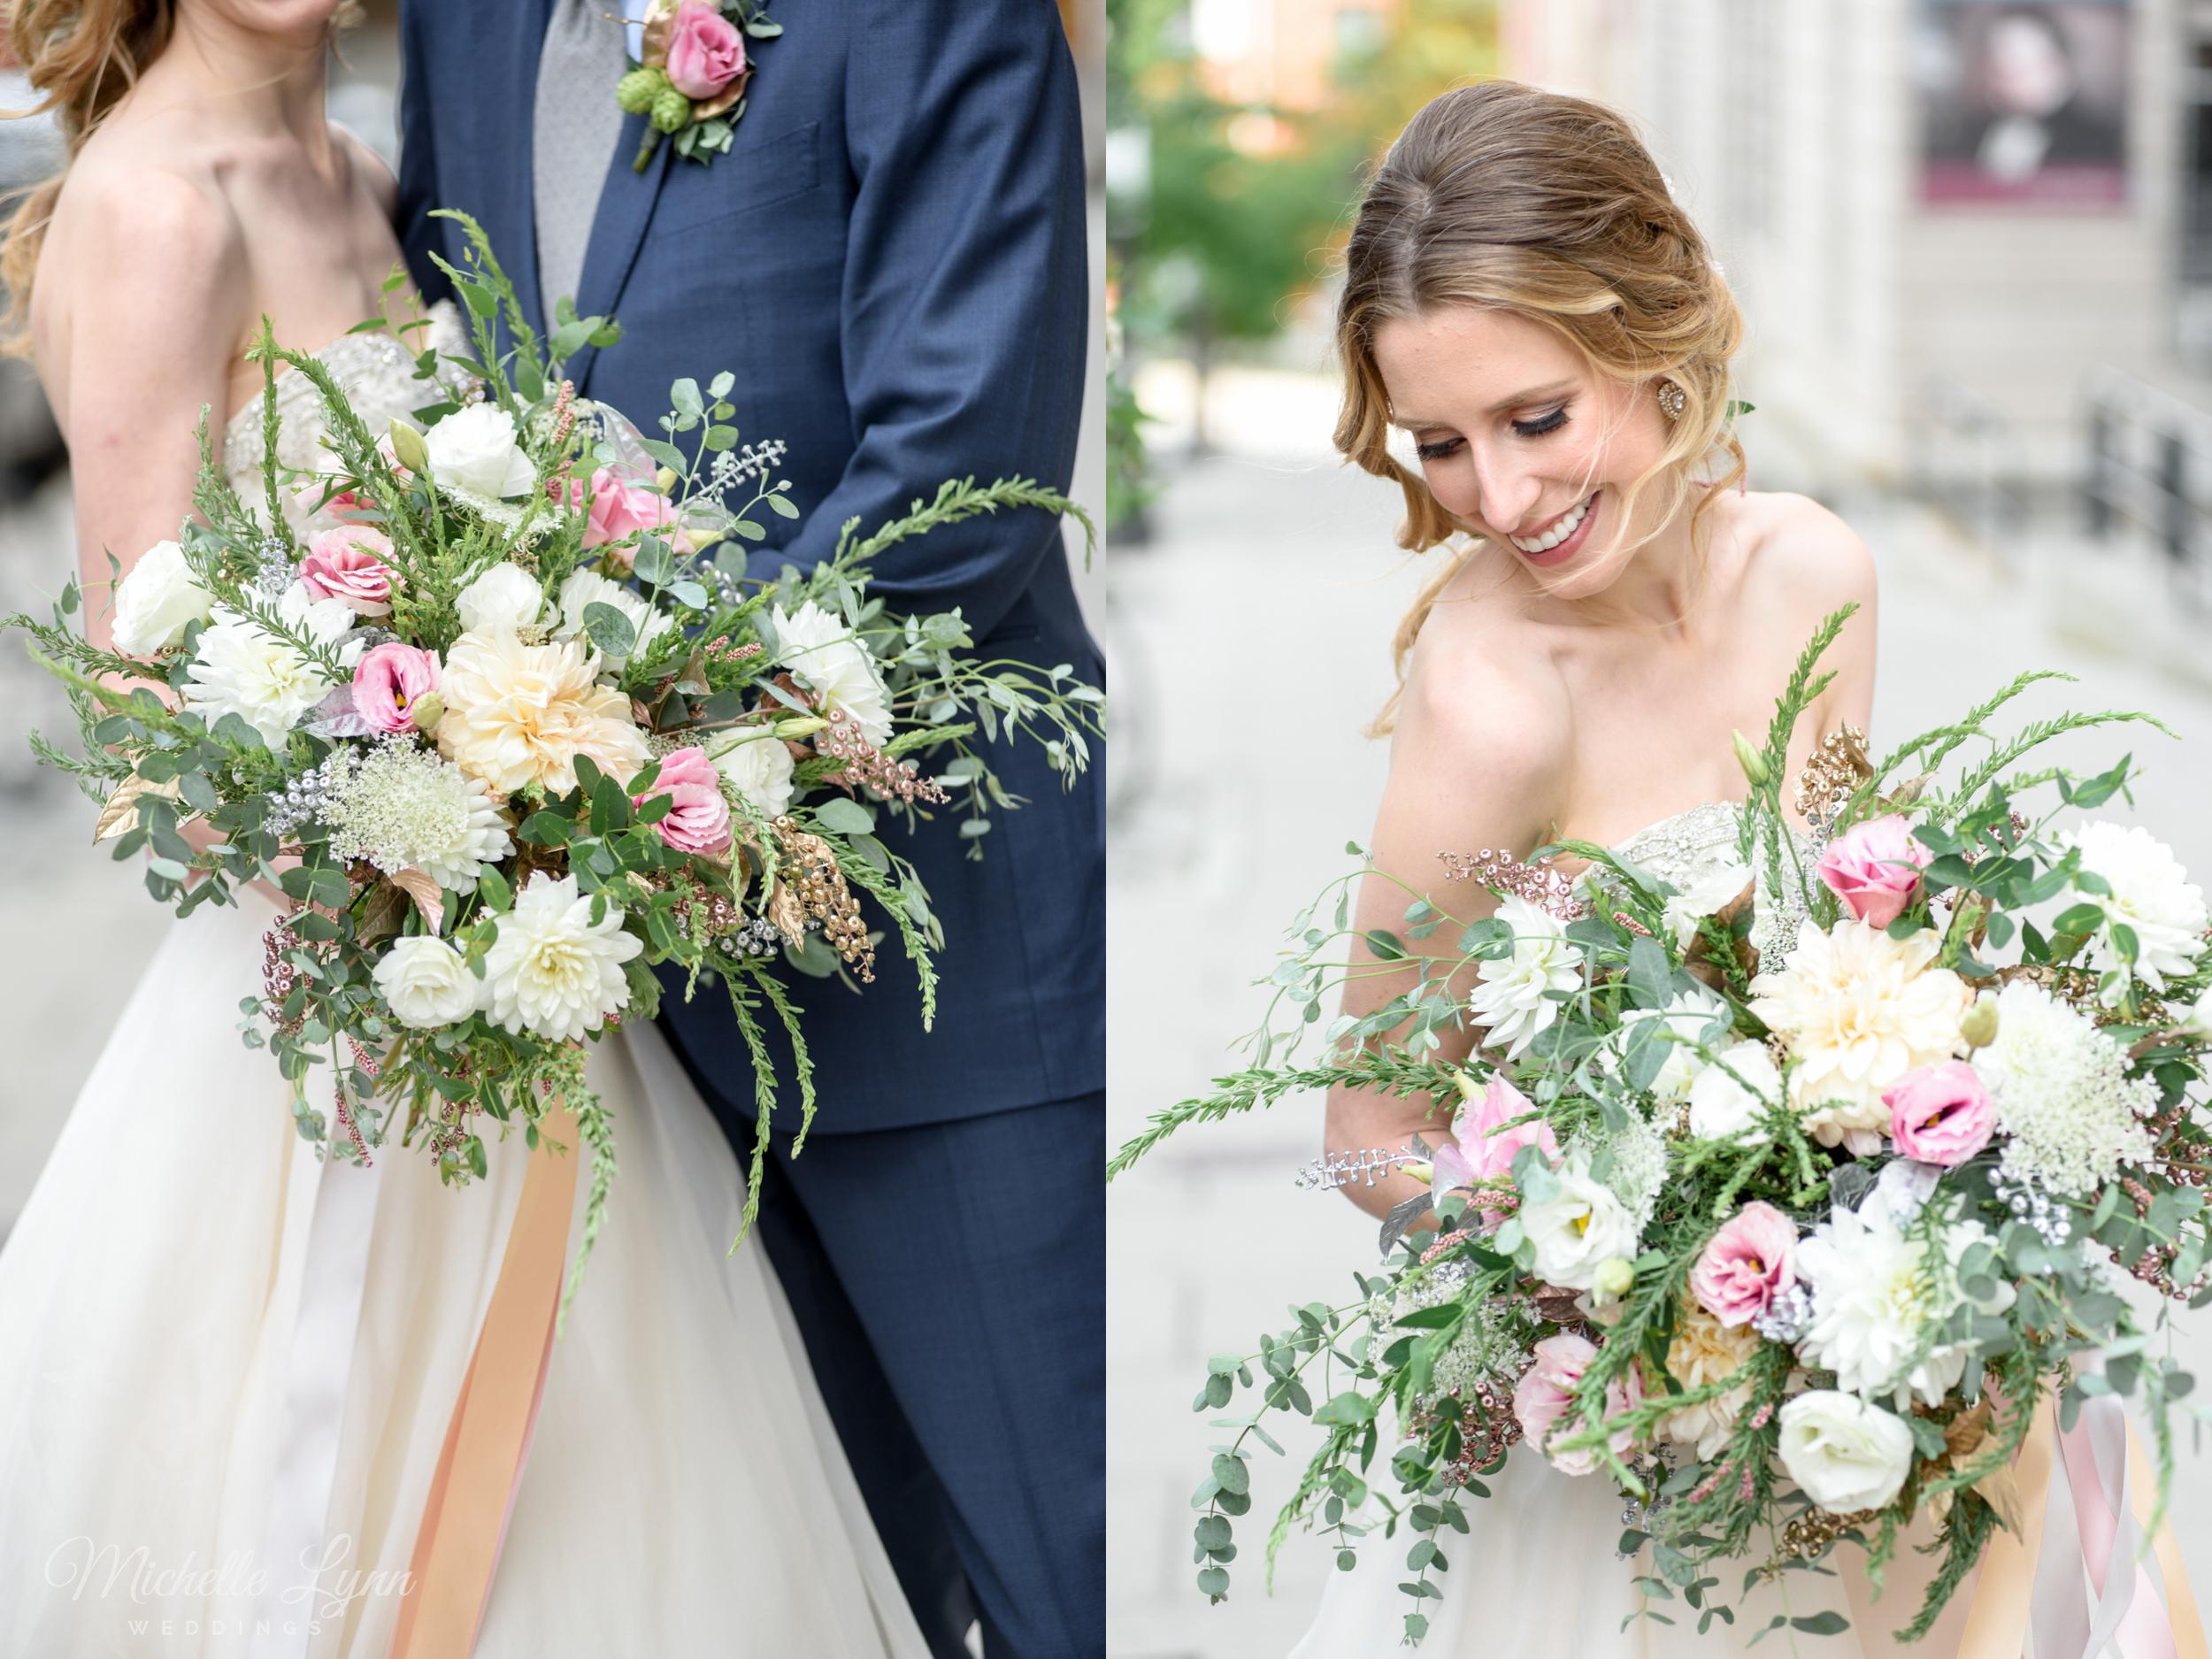 George_Peabody_Library-Wedding_Styled_Shoot-5.jpg